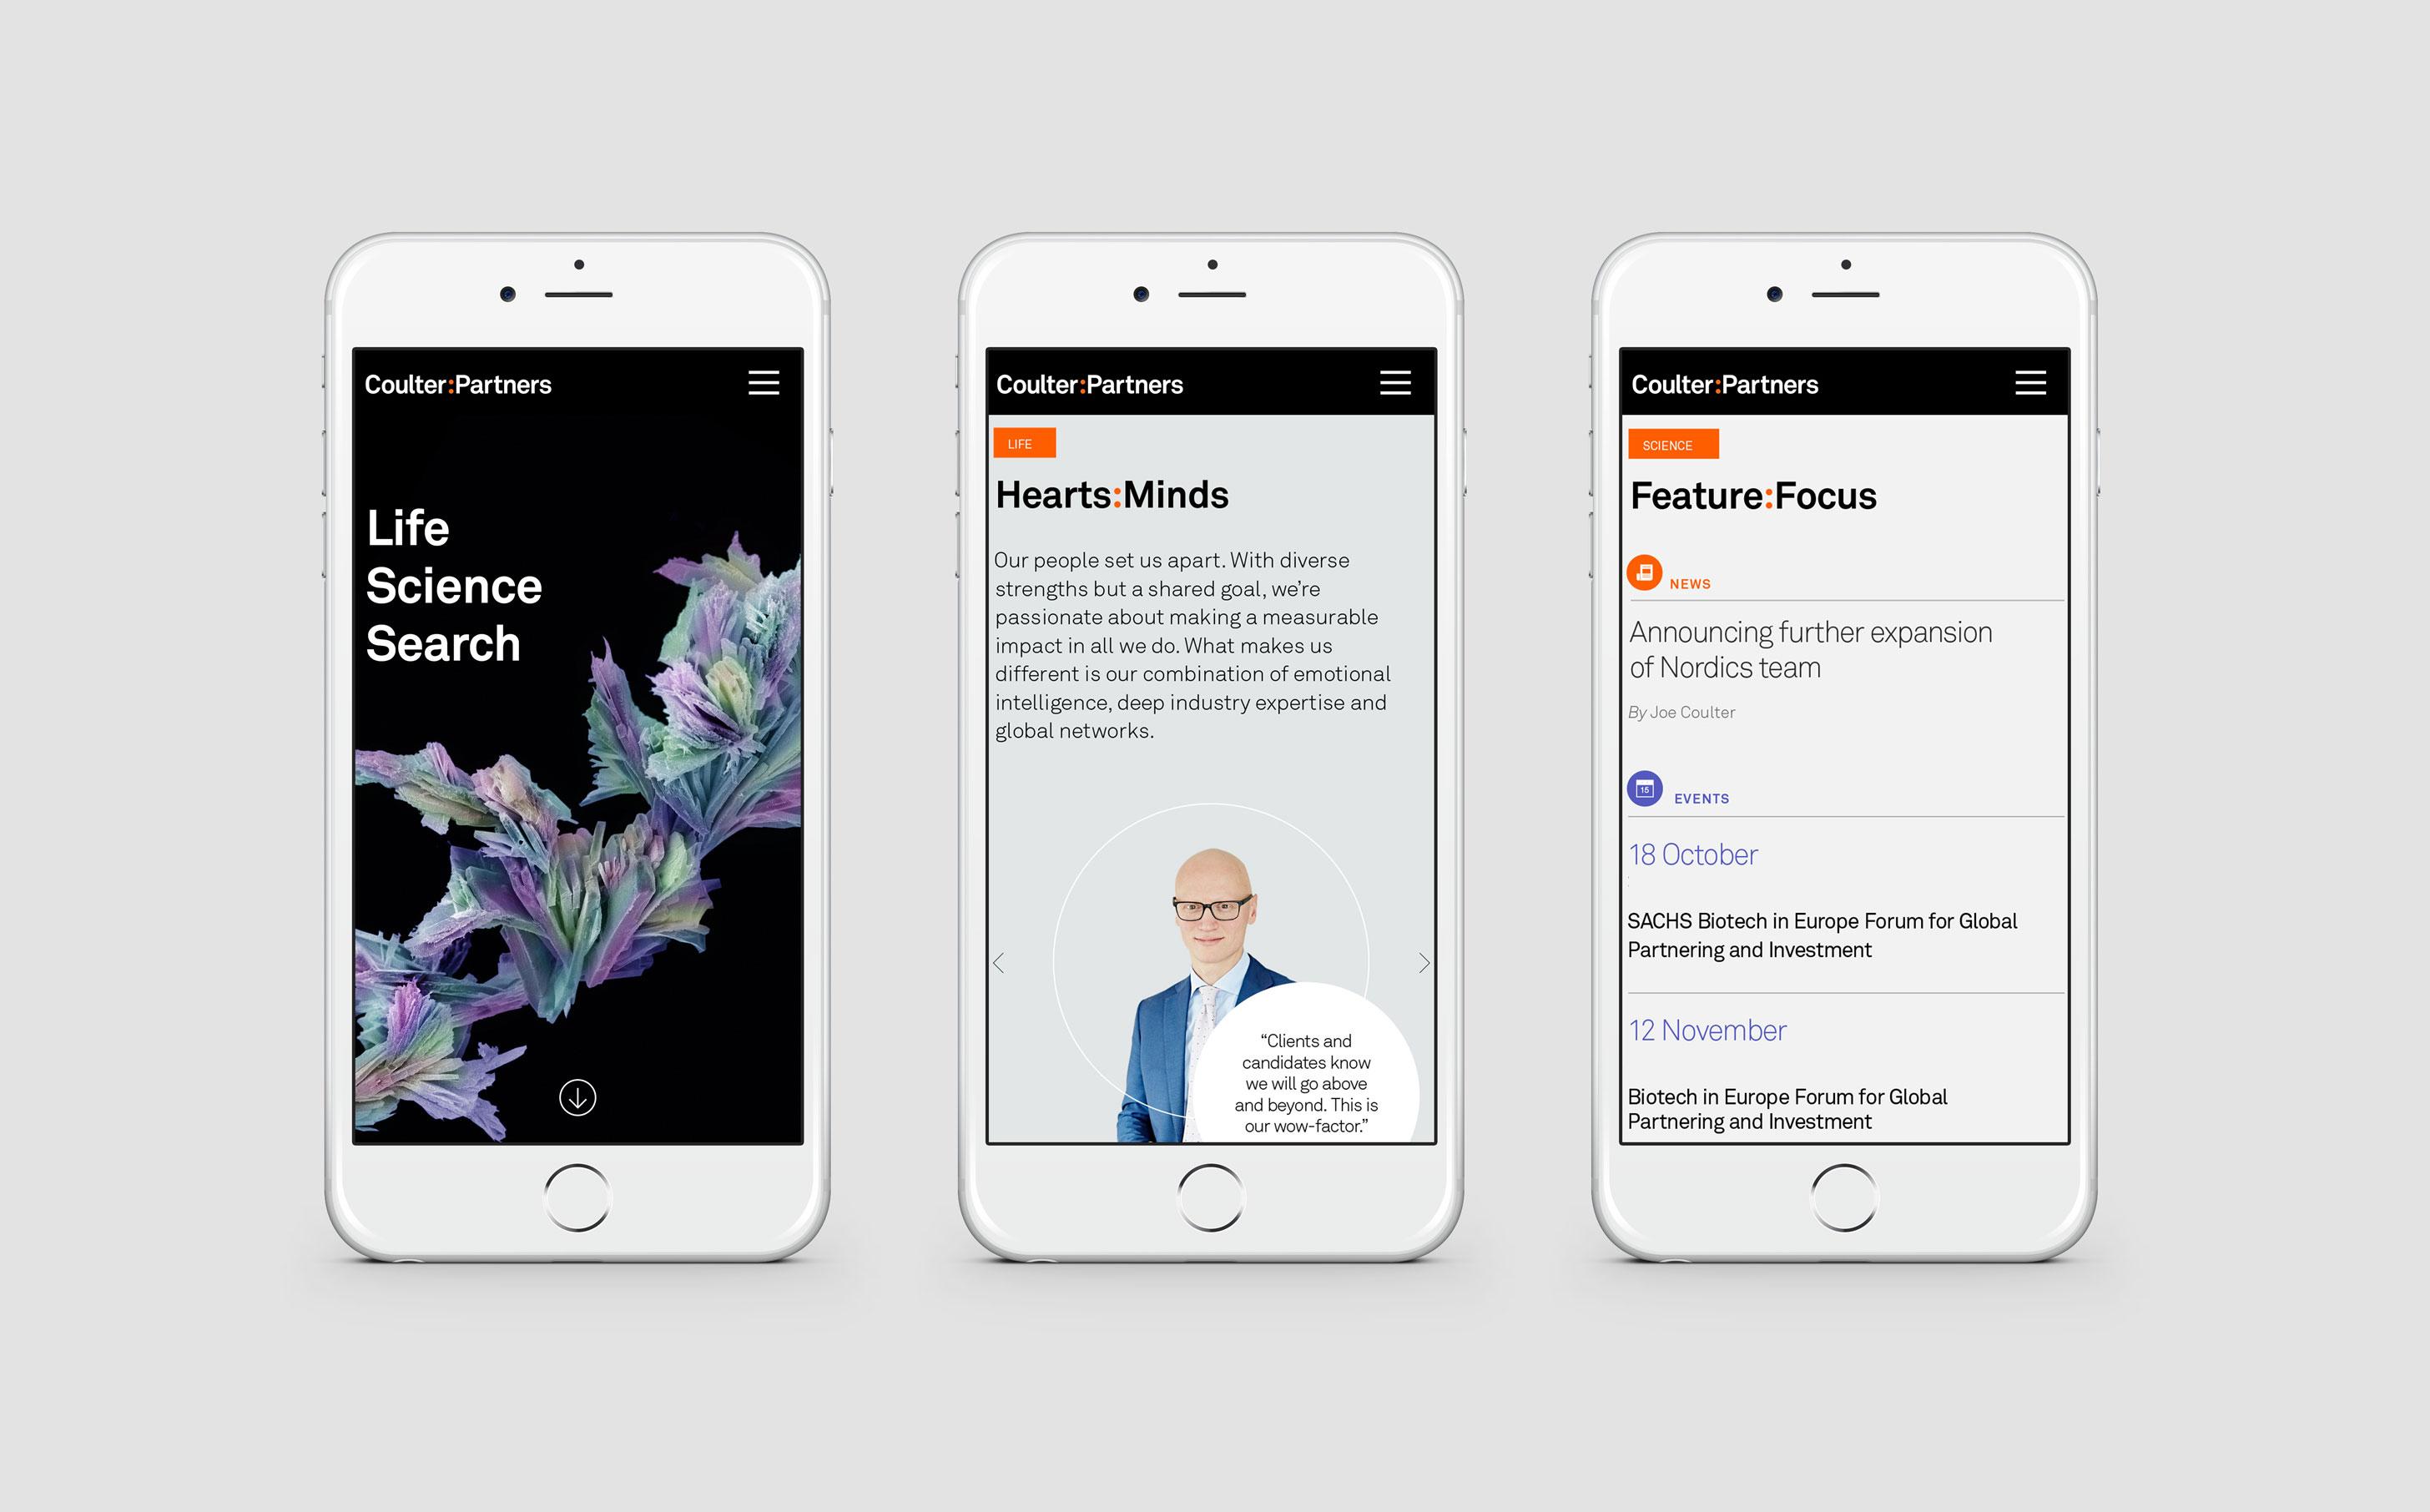 coulter-partners-website-mobile-design